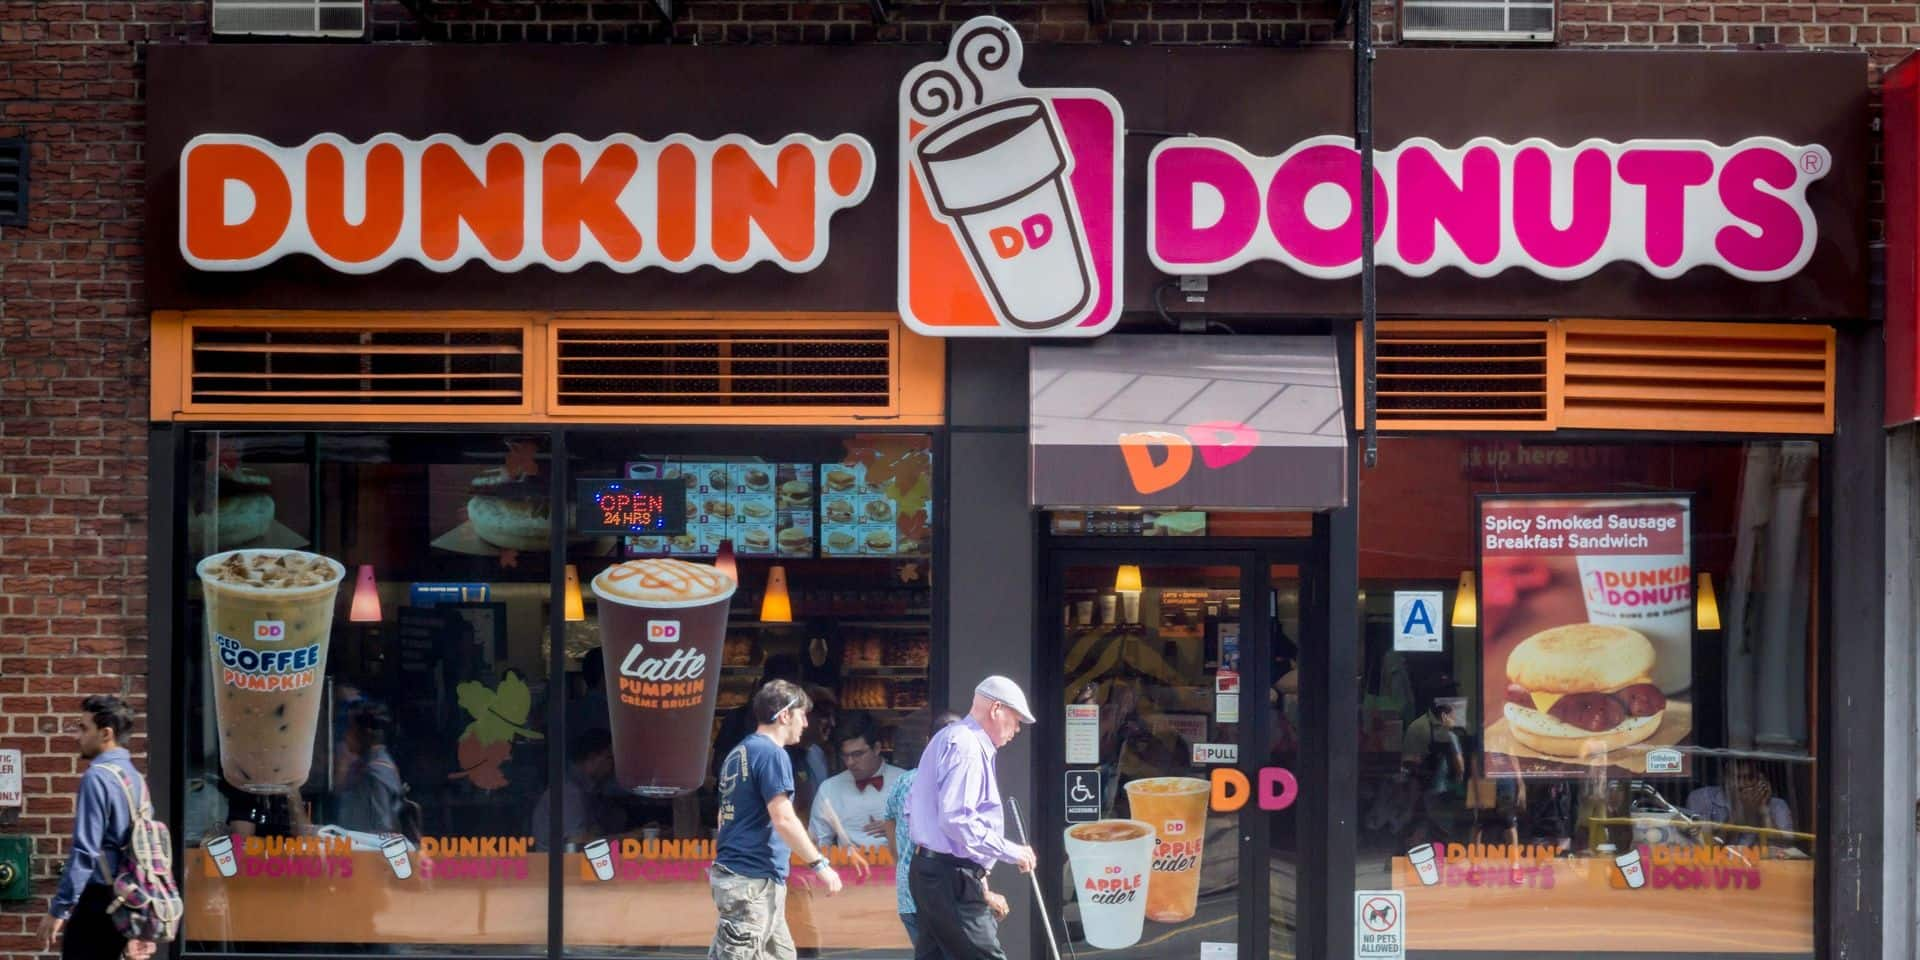 Dunkin Donuts Auswahl